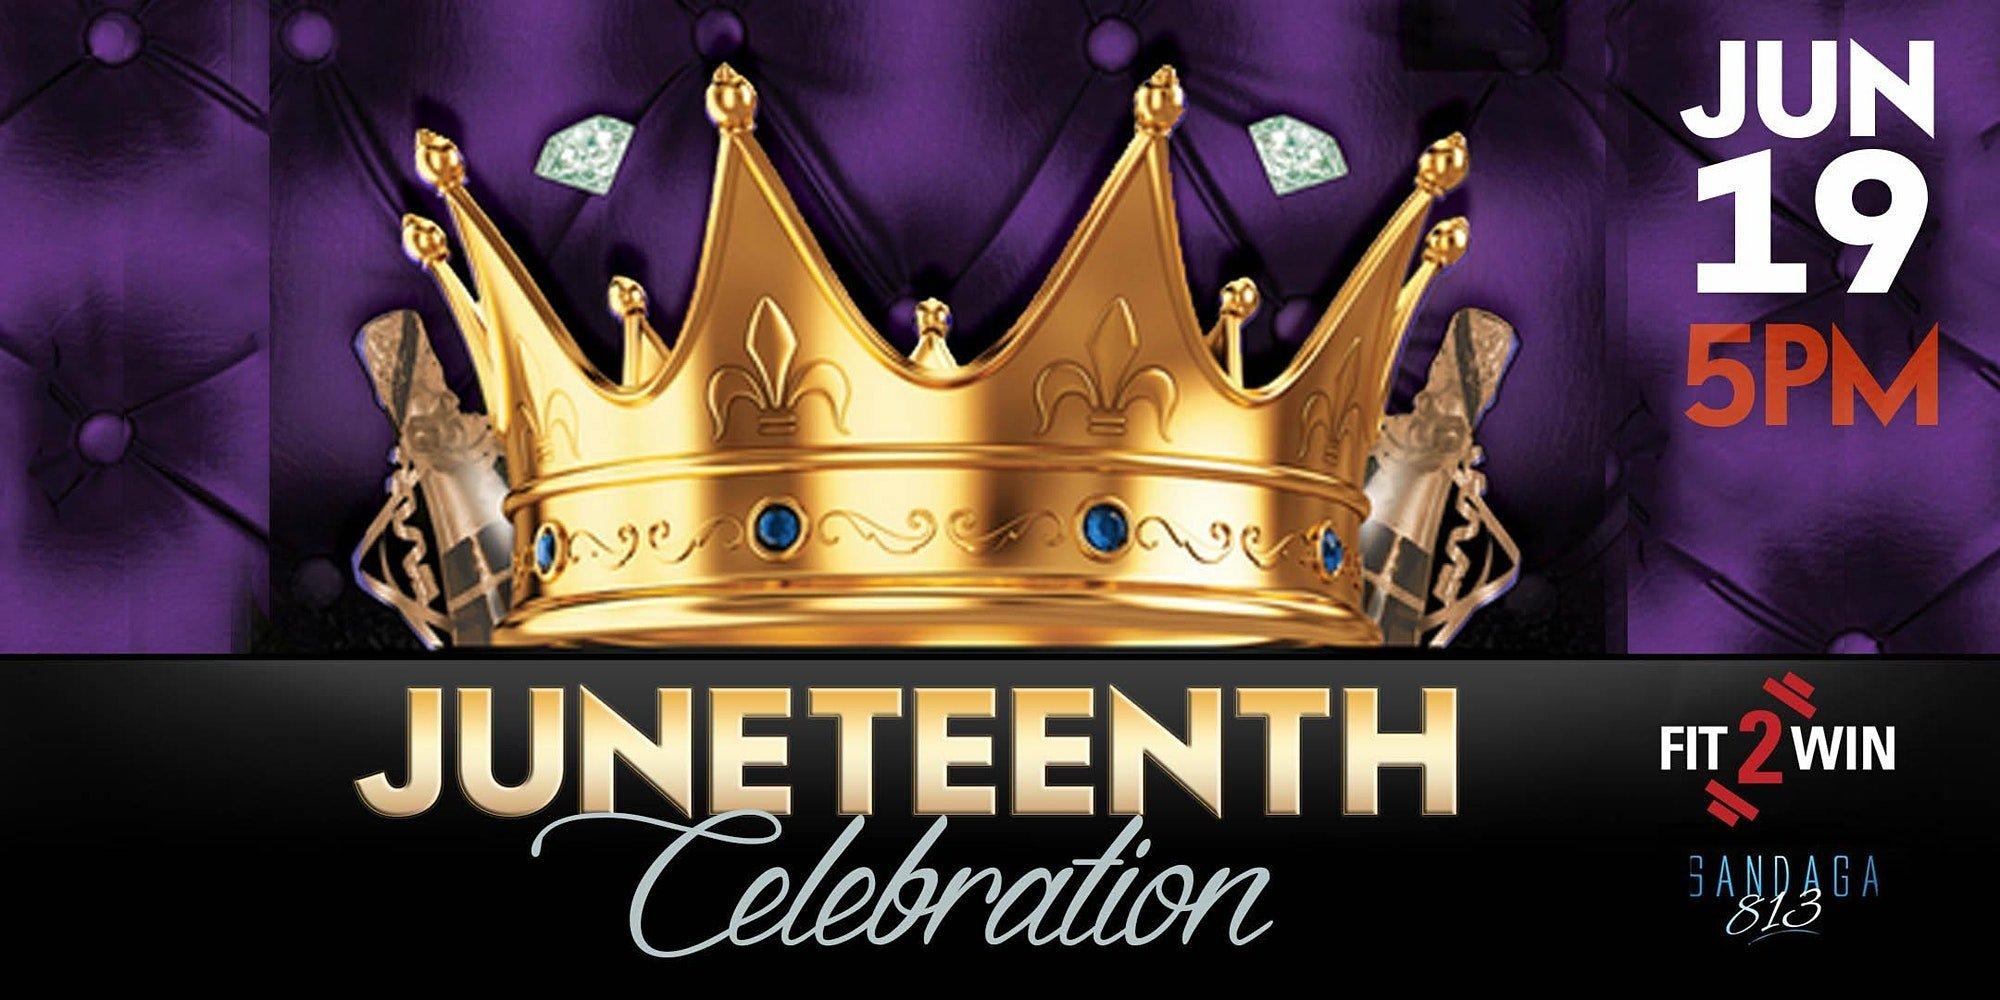 Juneteenth Celebration: Wear Your Crown